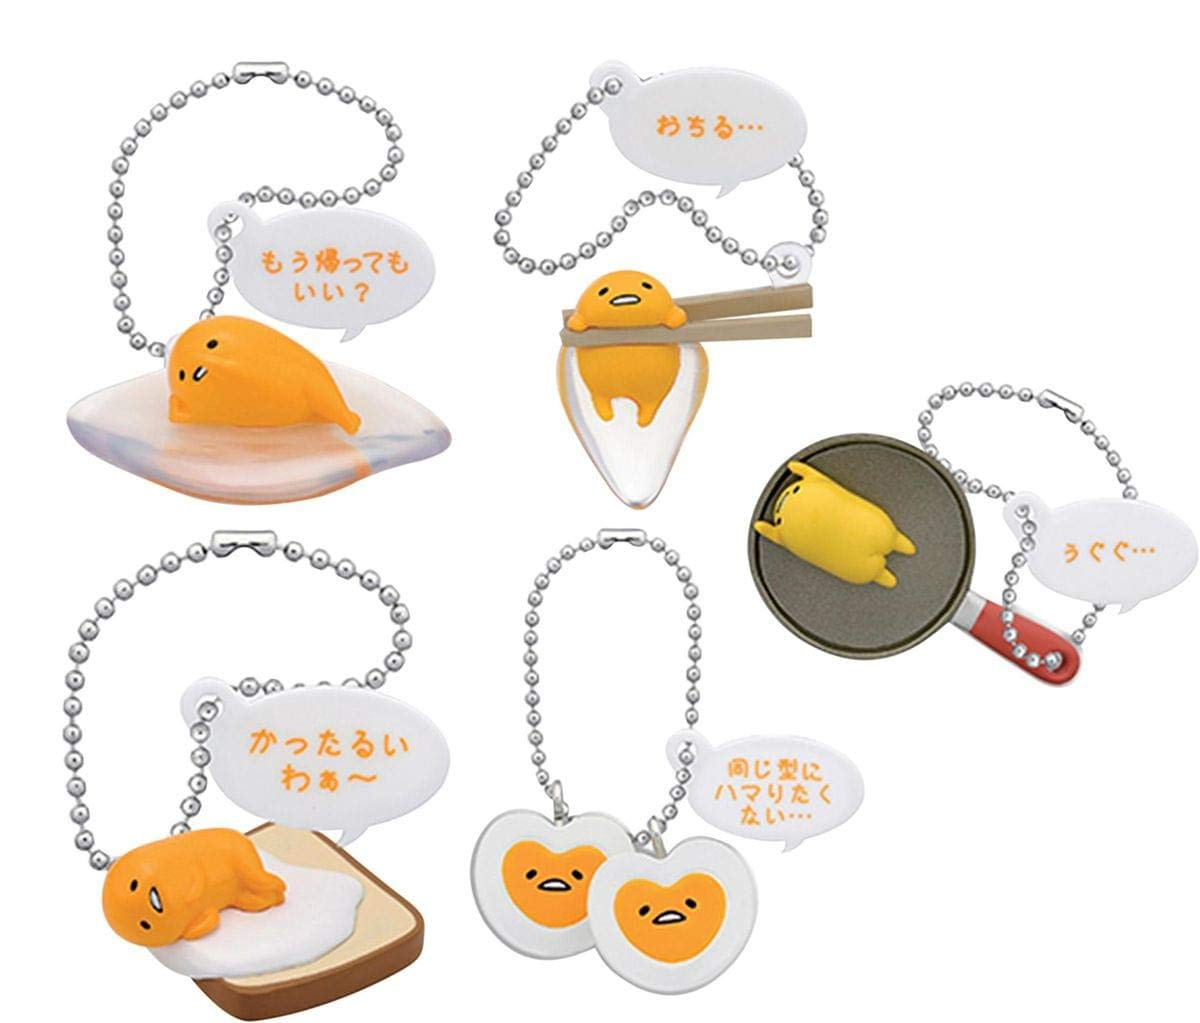 Amazon.com: Toynk Gudetama The Lazy Egg Series 1 Blind Bag ...